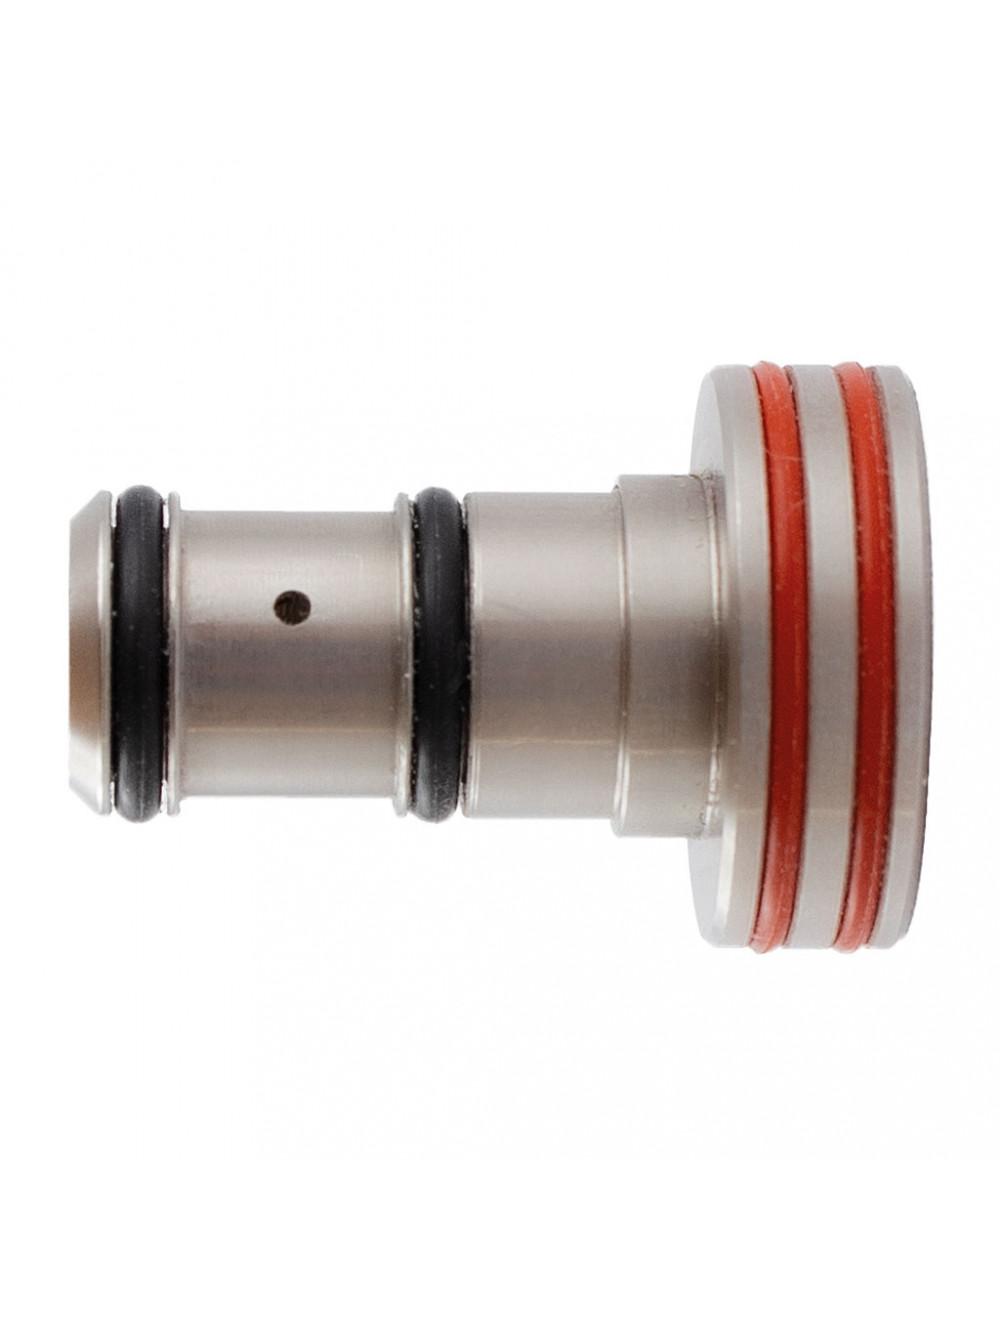 Alpro WL-Adapter 12/MF 3564